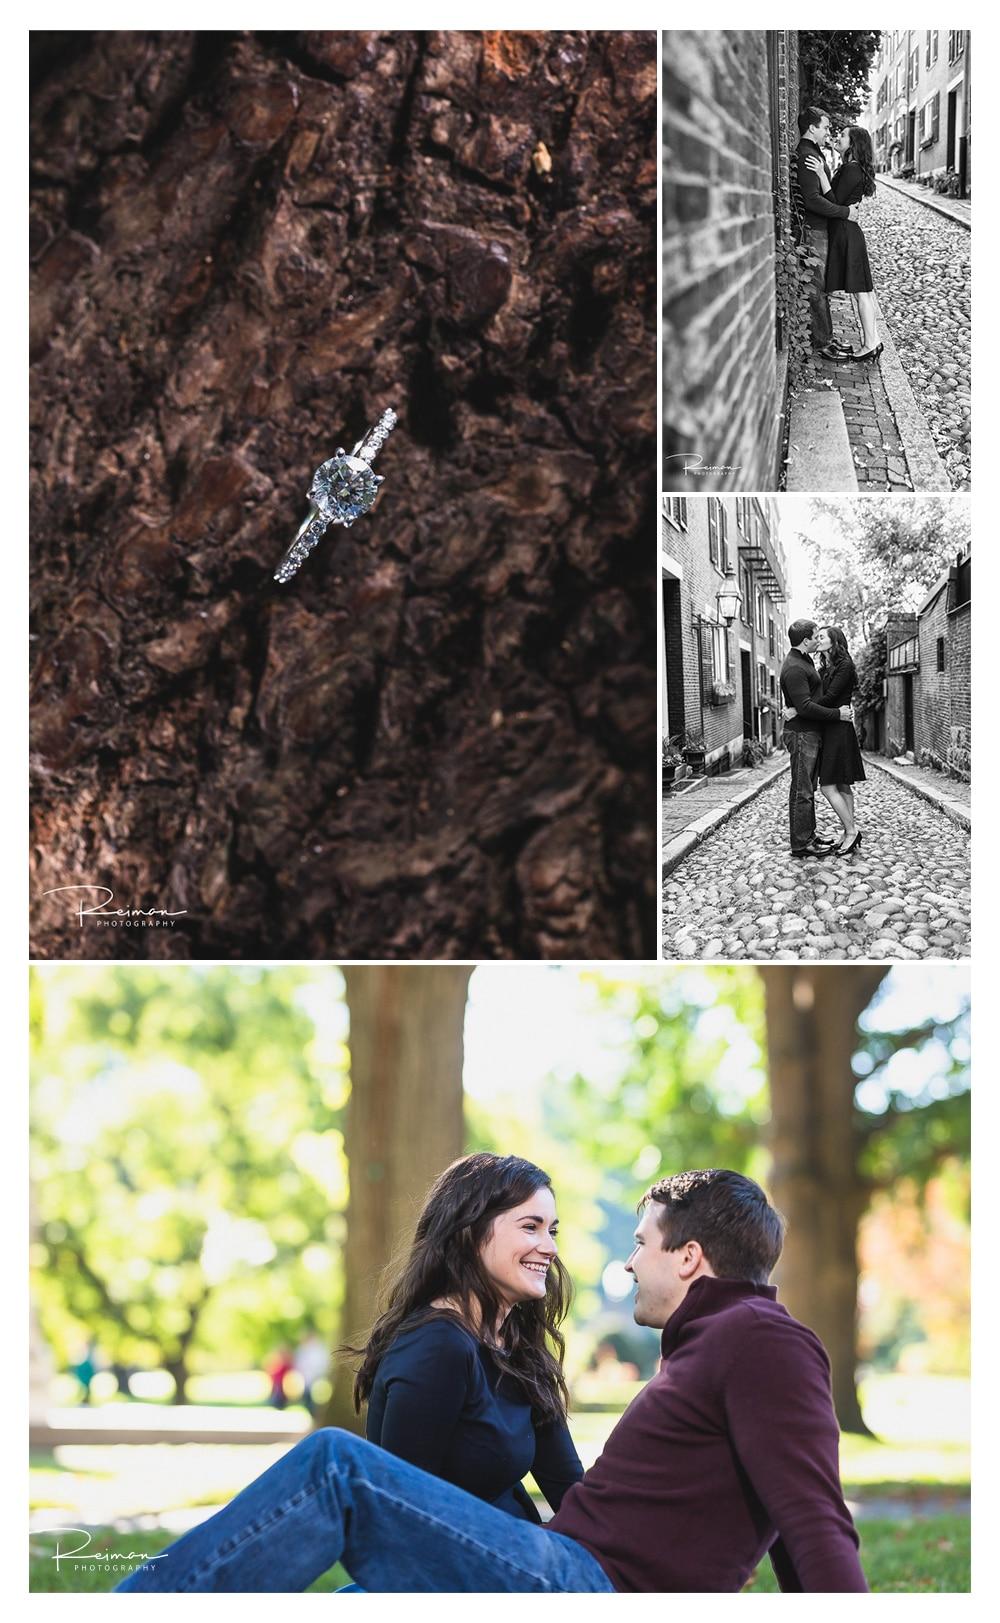 Boston Engagement Session, Fall, October, Reiman Photography, Acorn Street, Public Garden